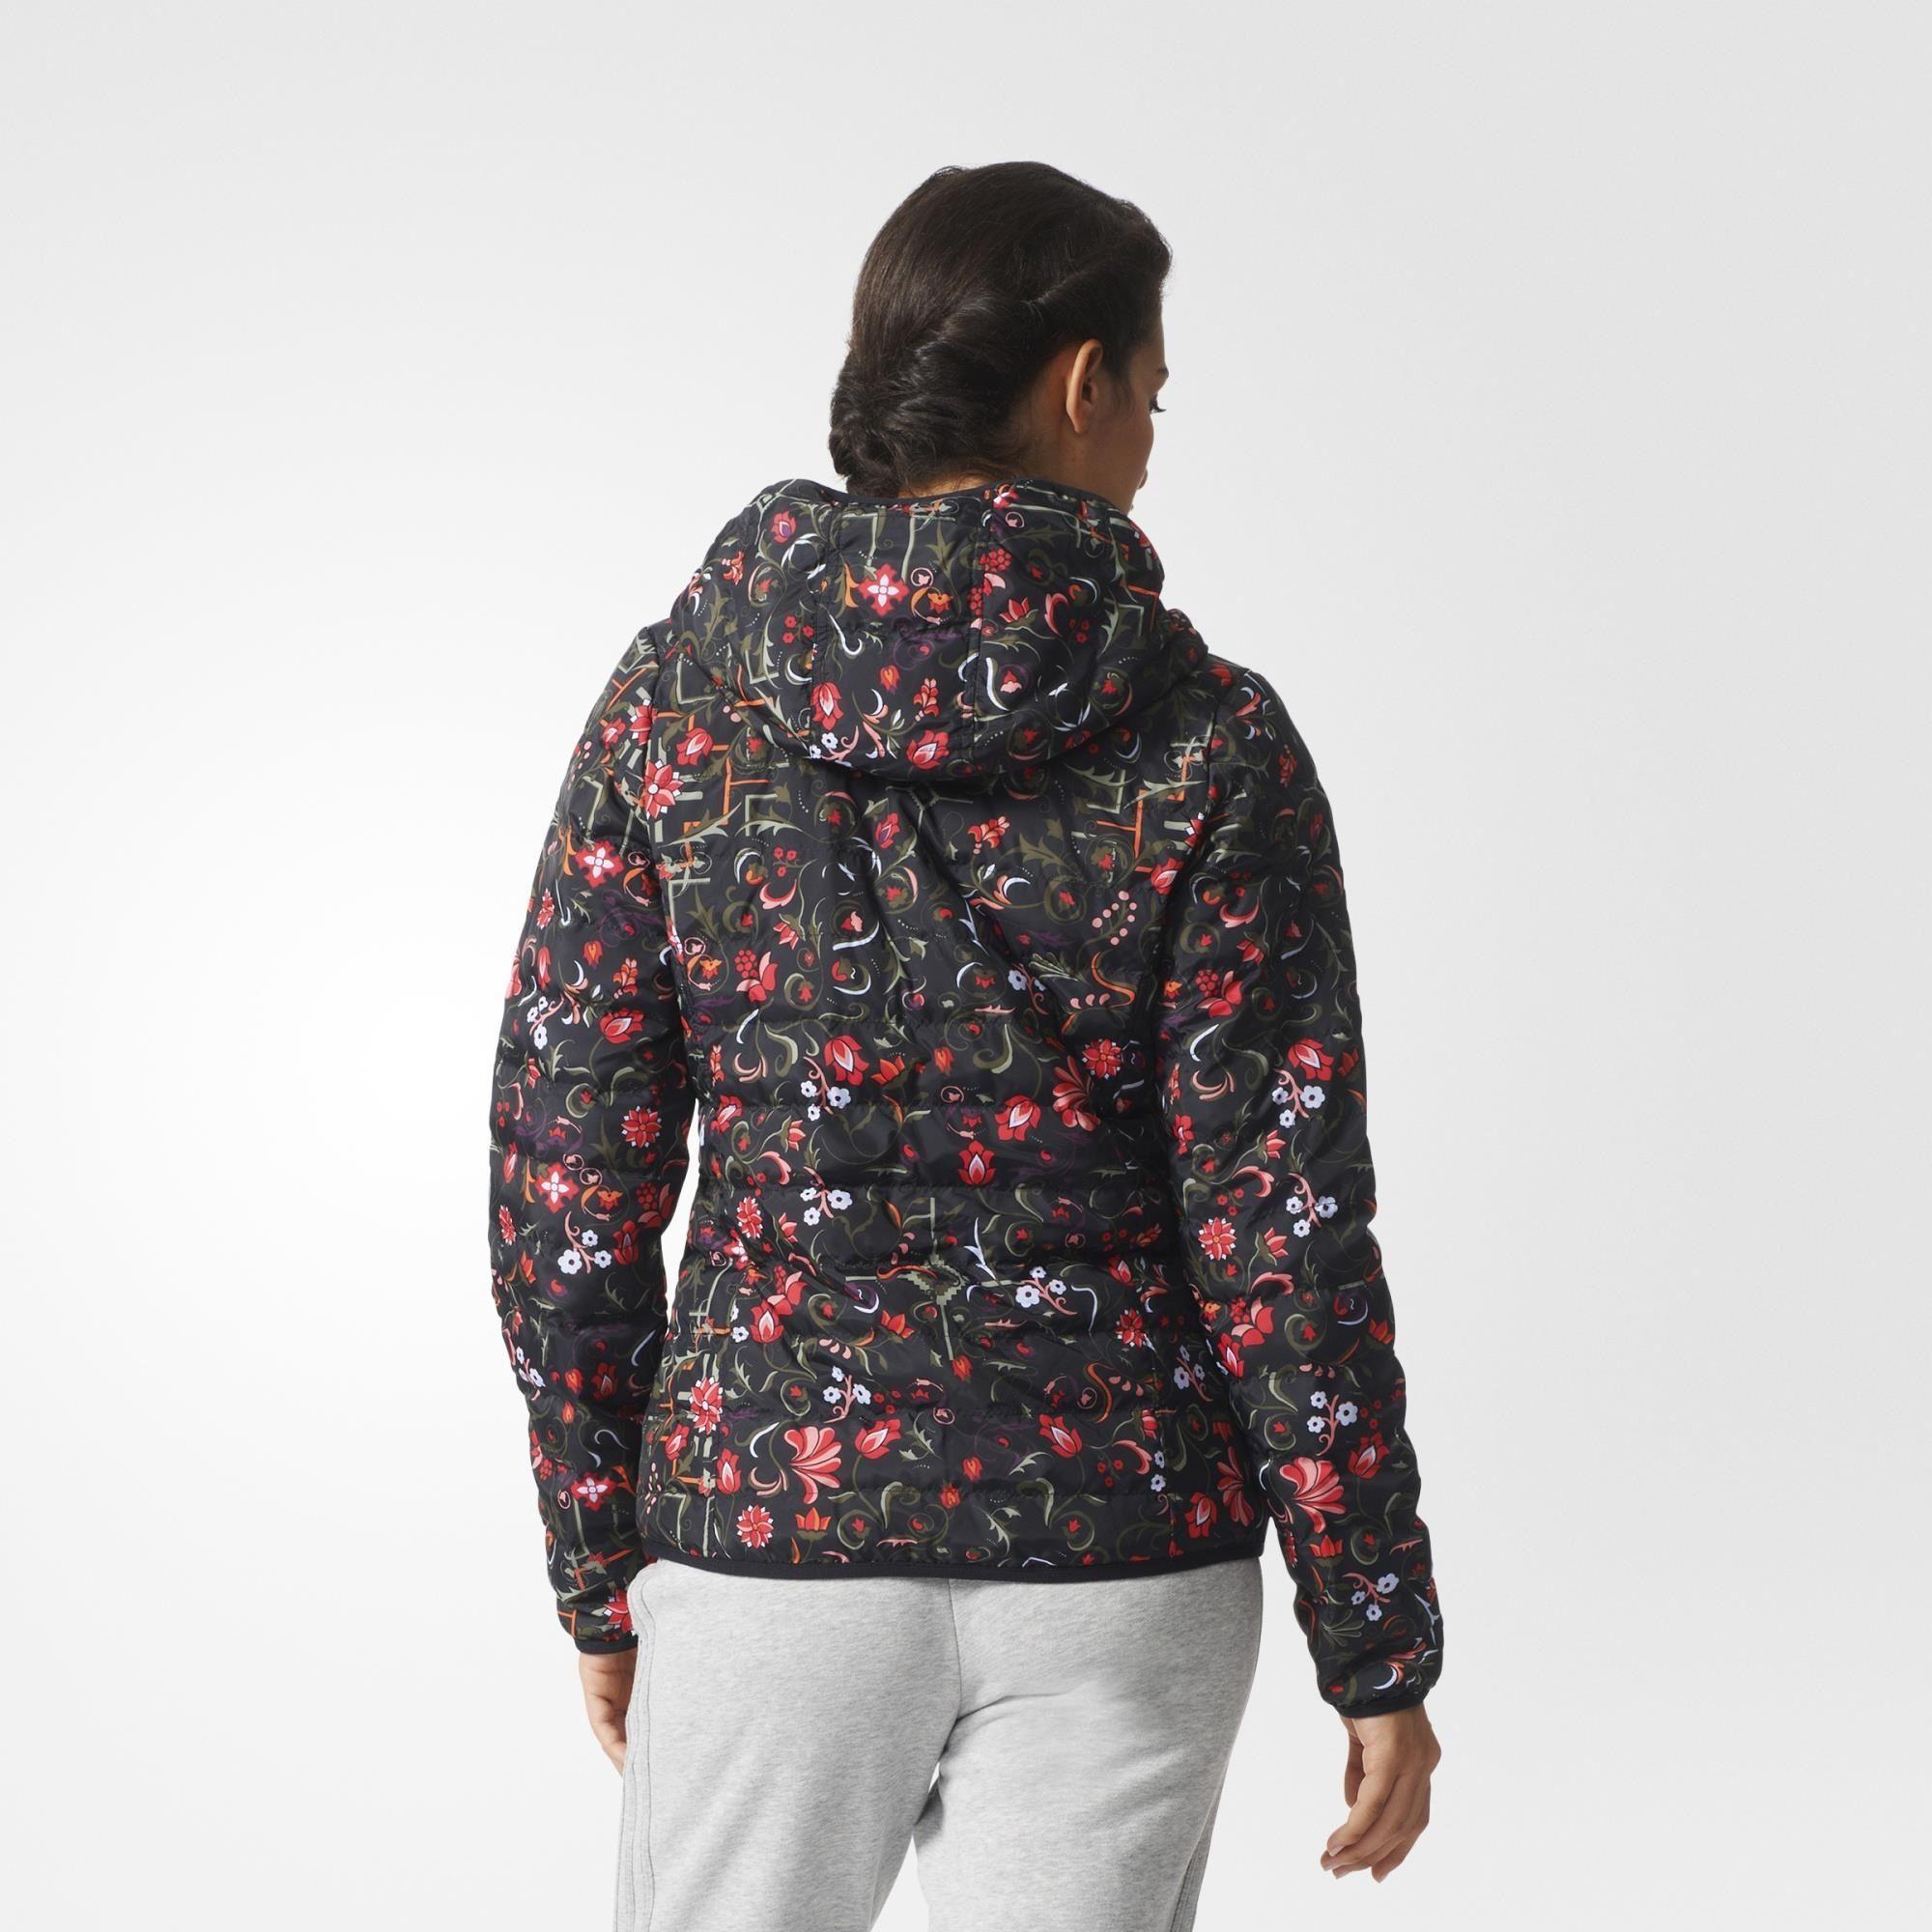 chaqueta slim adidas mujer